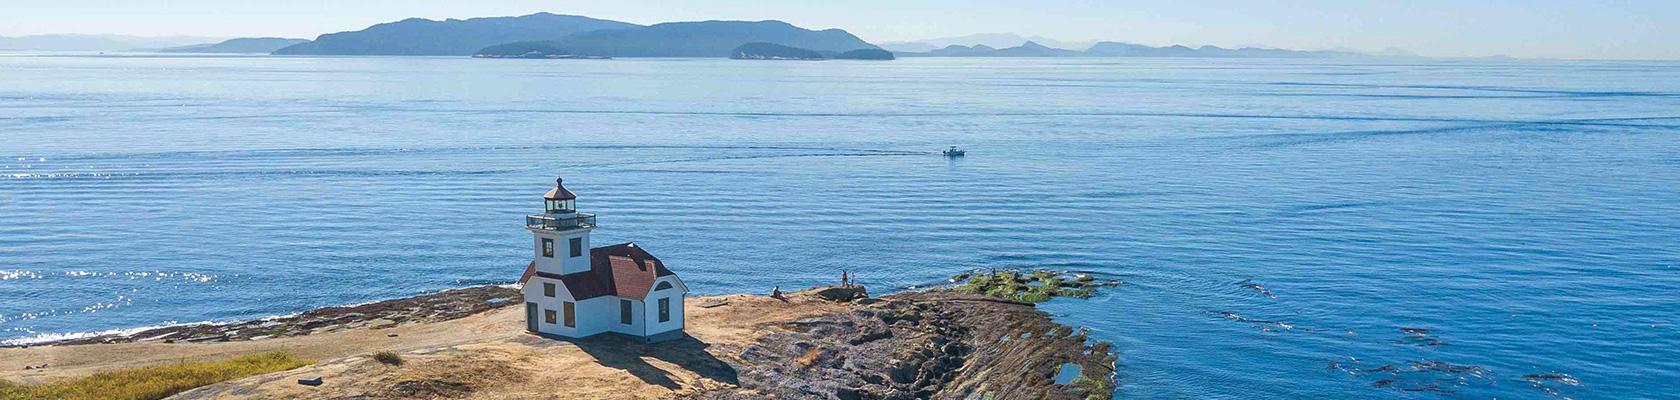 Lime Kiln Lighthouse, San Juan Island